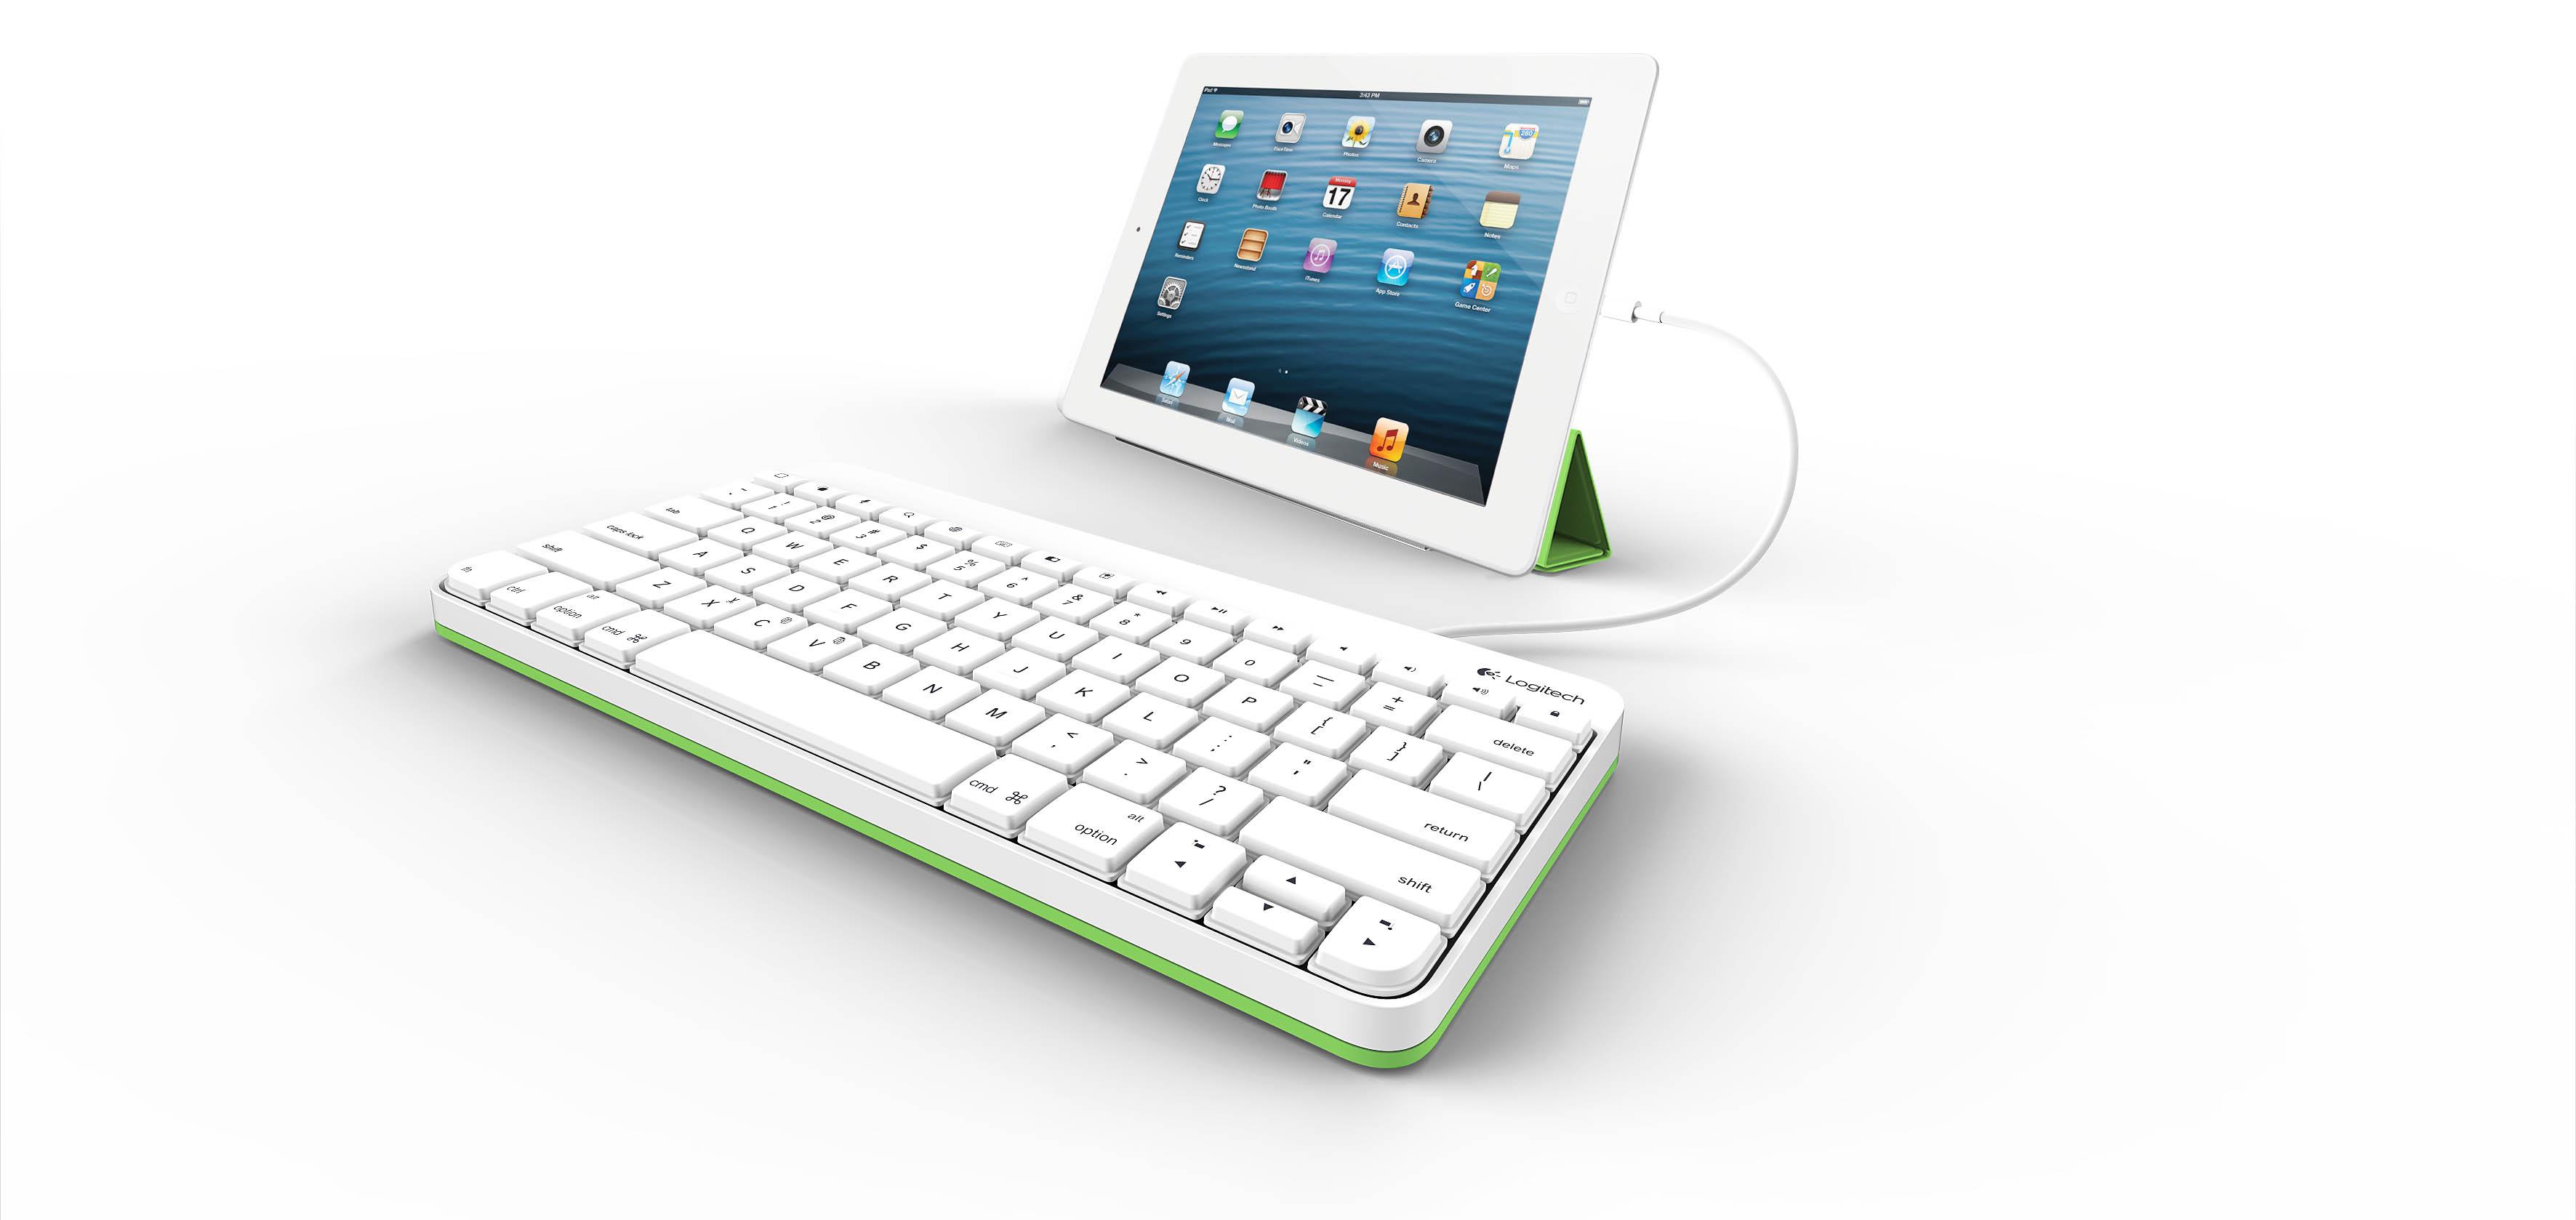 logitech tablet keyboard for ipad instructions